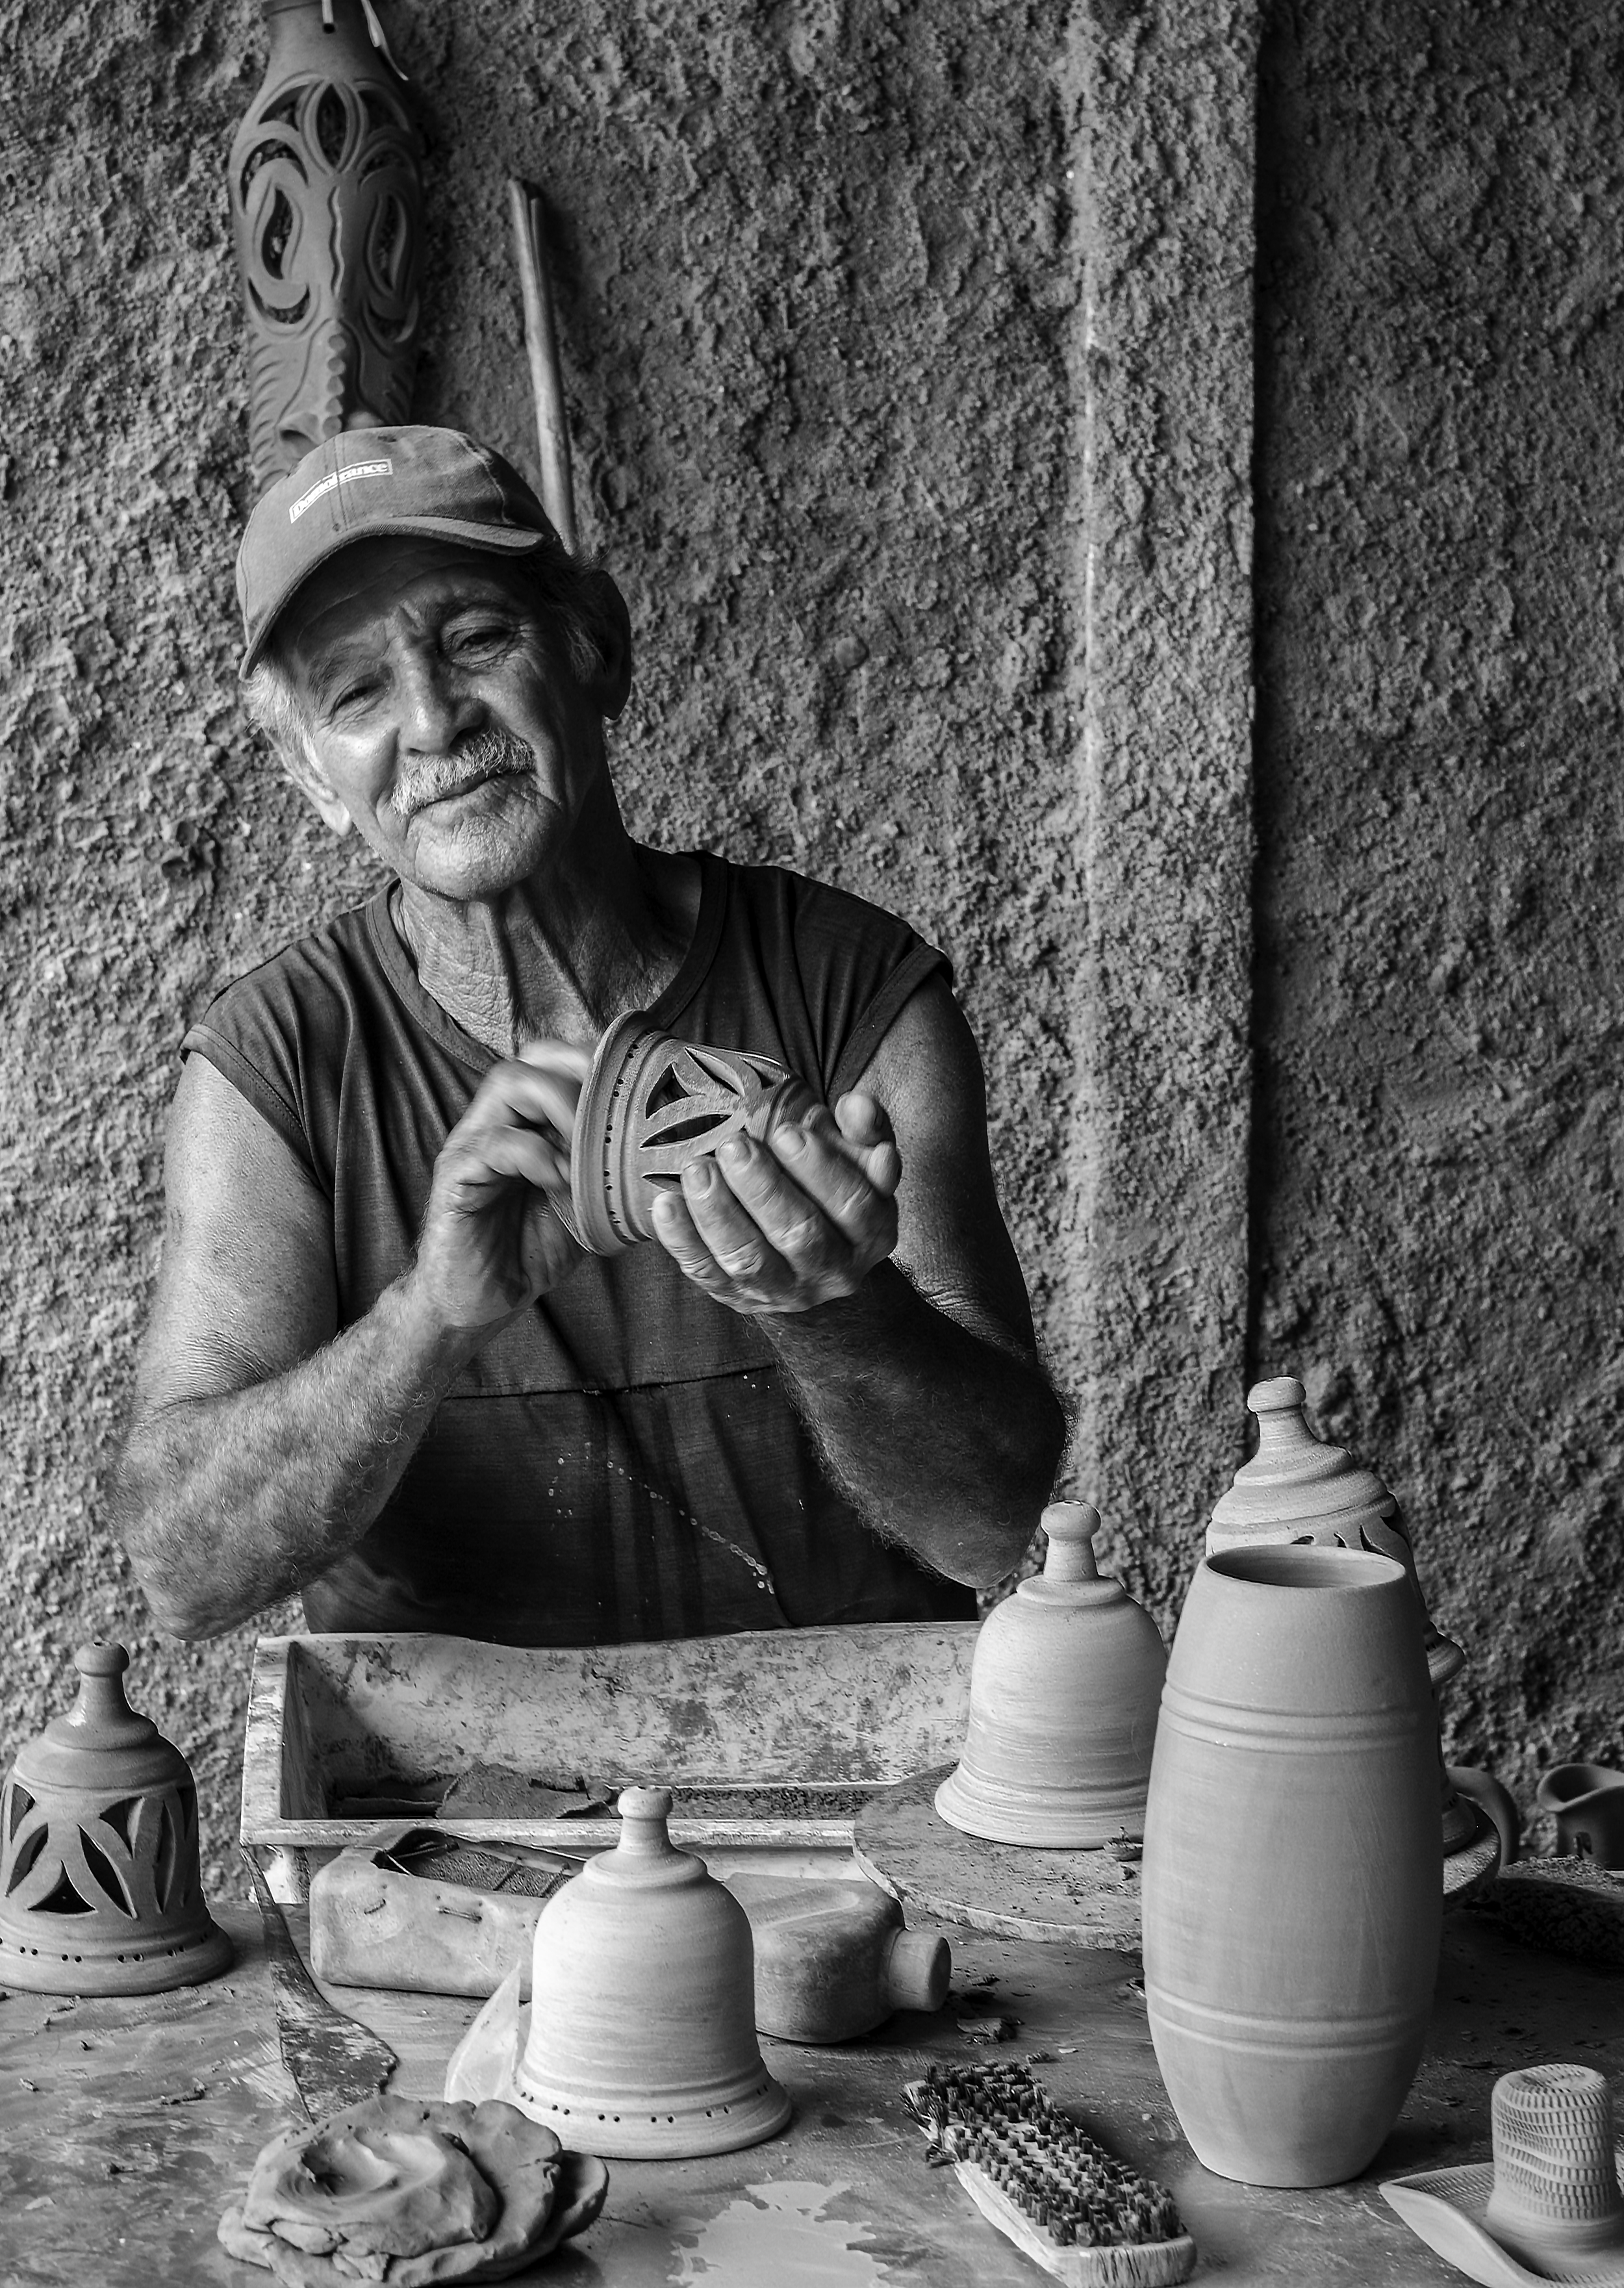 The Cuban Potter